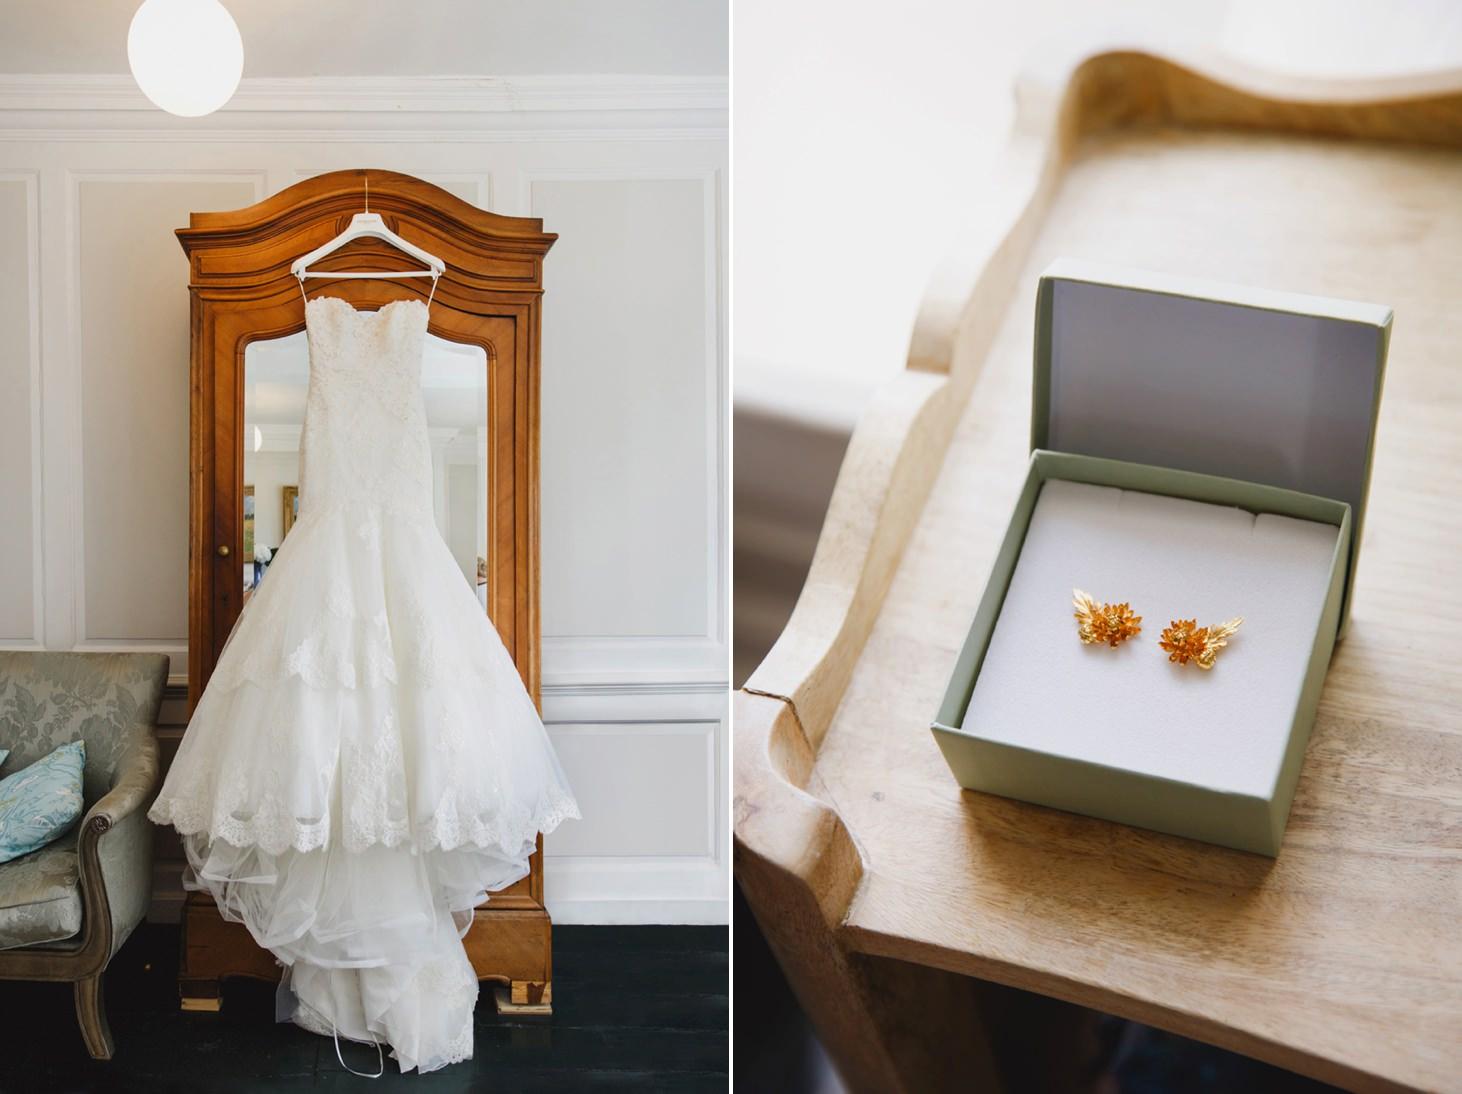 The Rectory Hotel Crudwell wedding dress